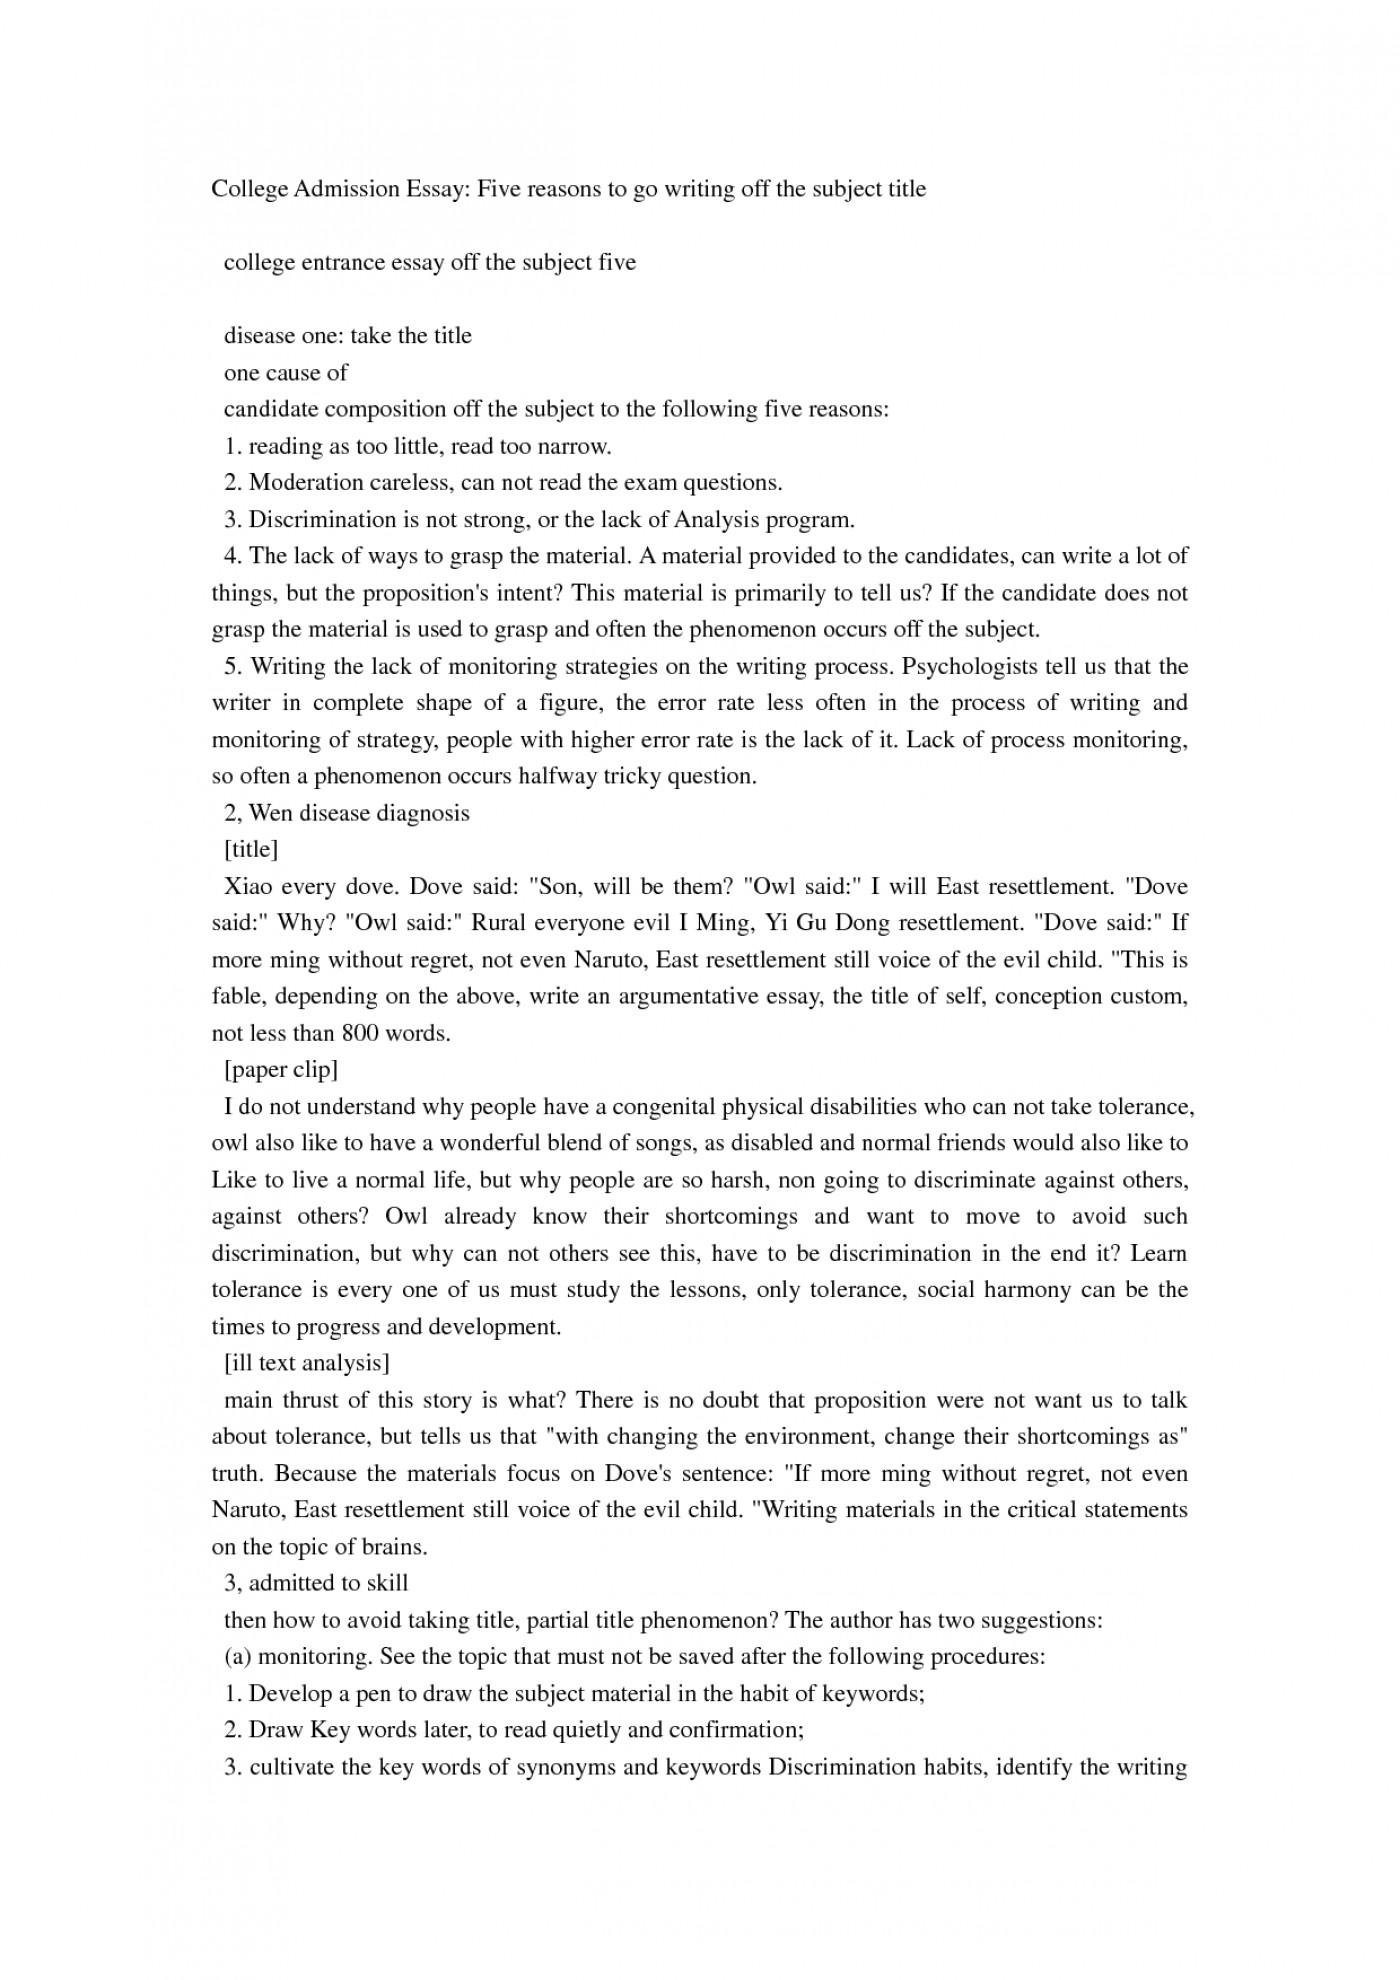 Dissertation vita page